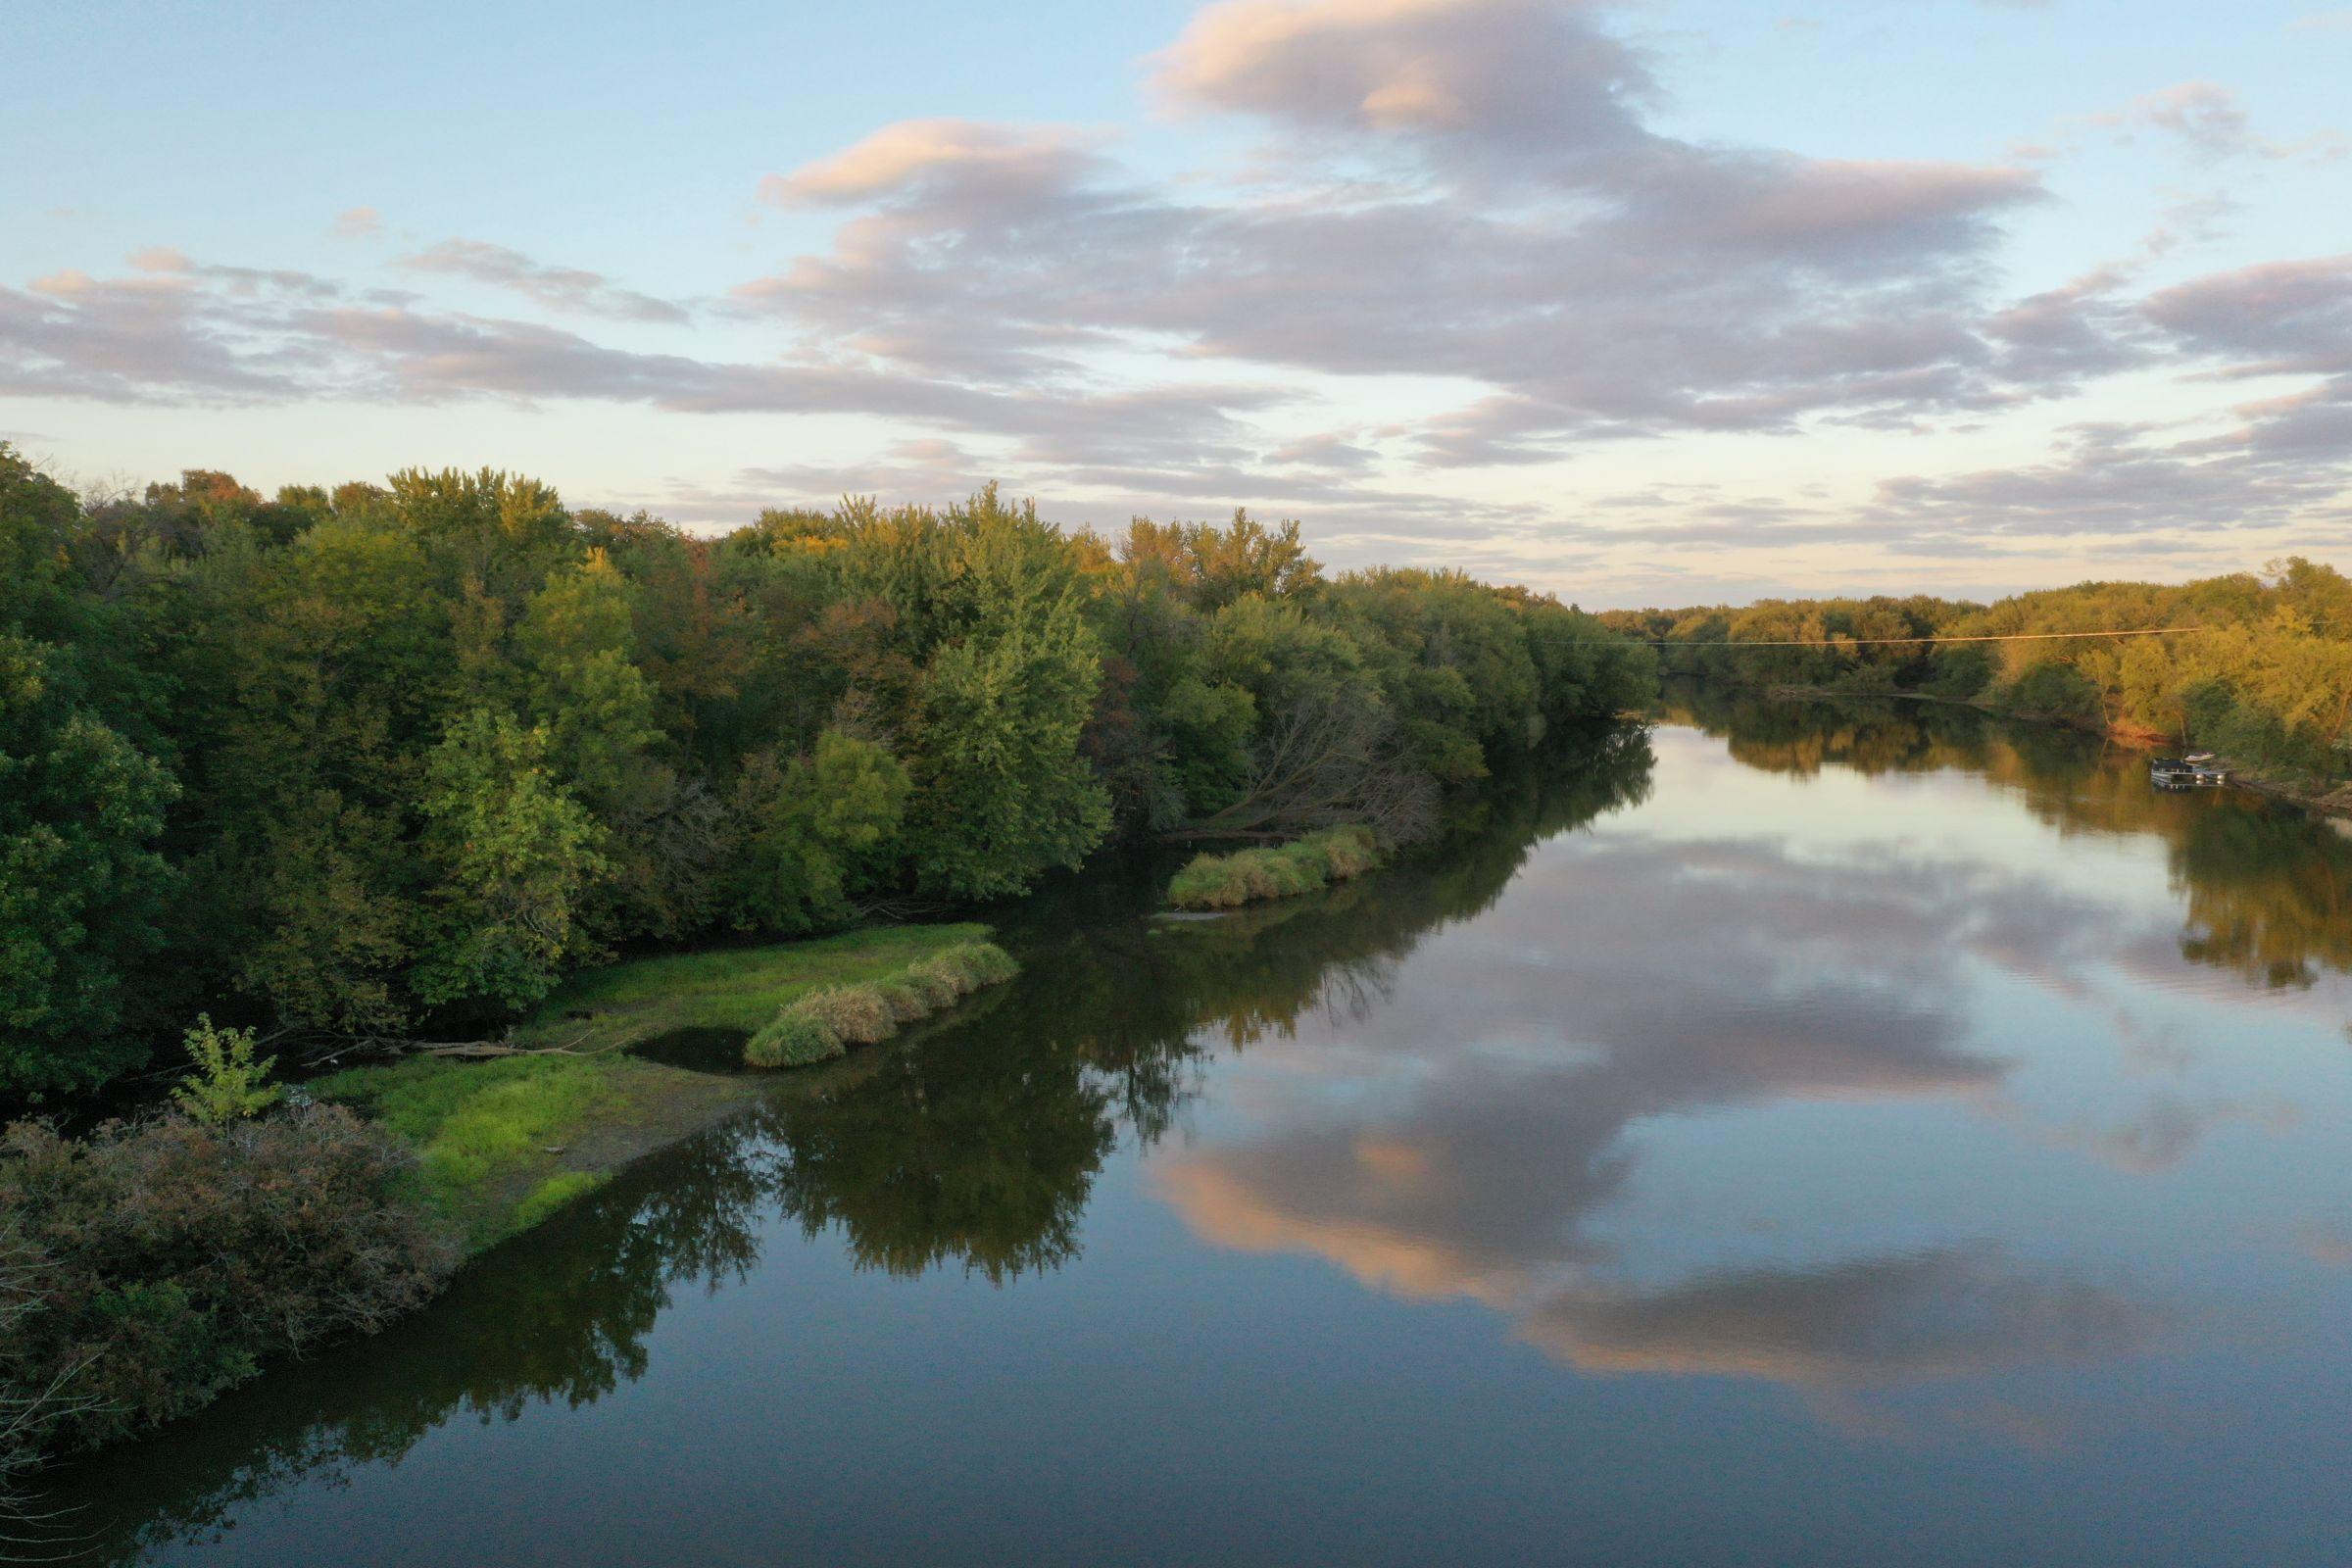 land-buchanan-county-iowa-33-acres-listing-number-14906-0-2020-10-28-160646.JPG